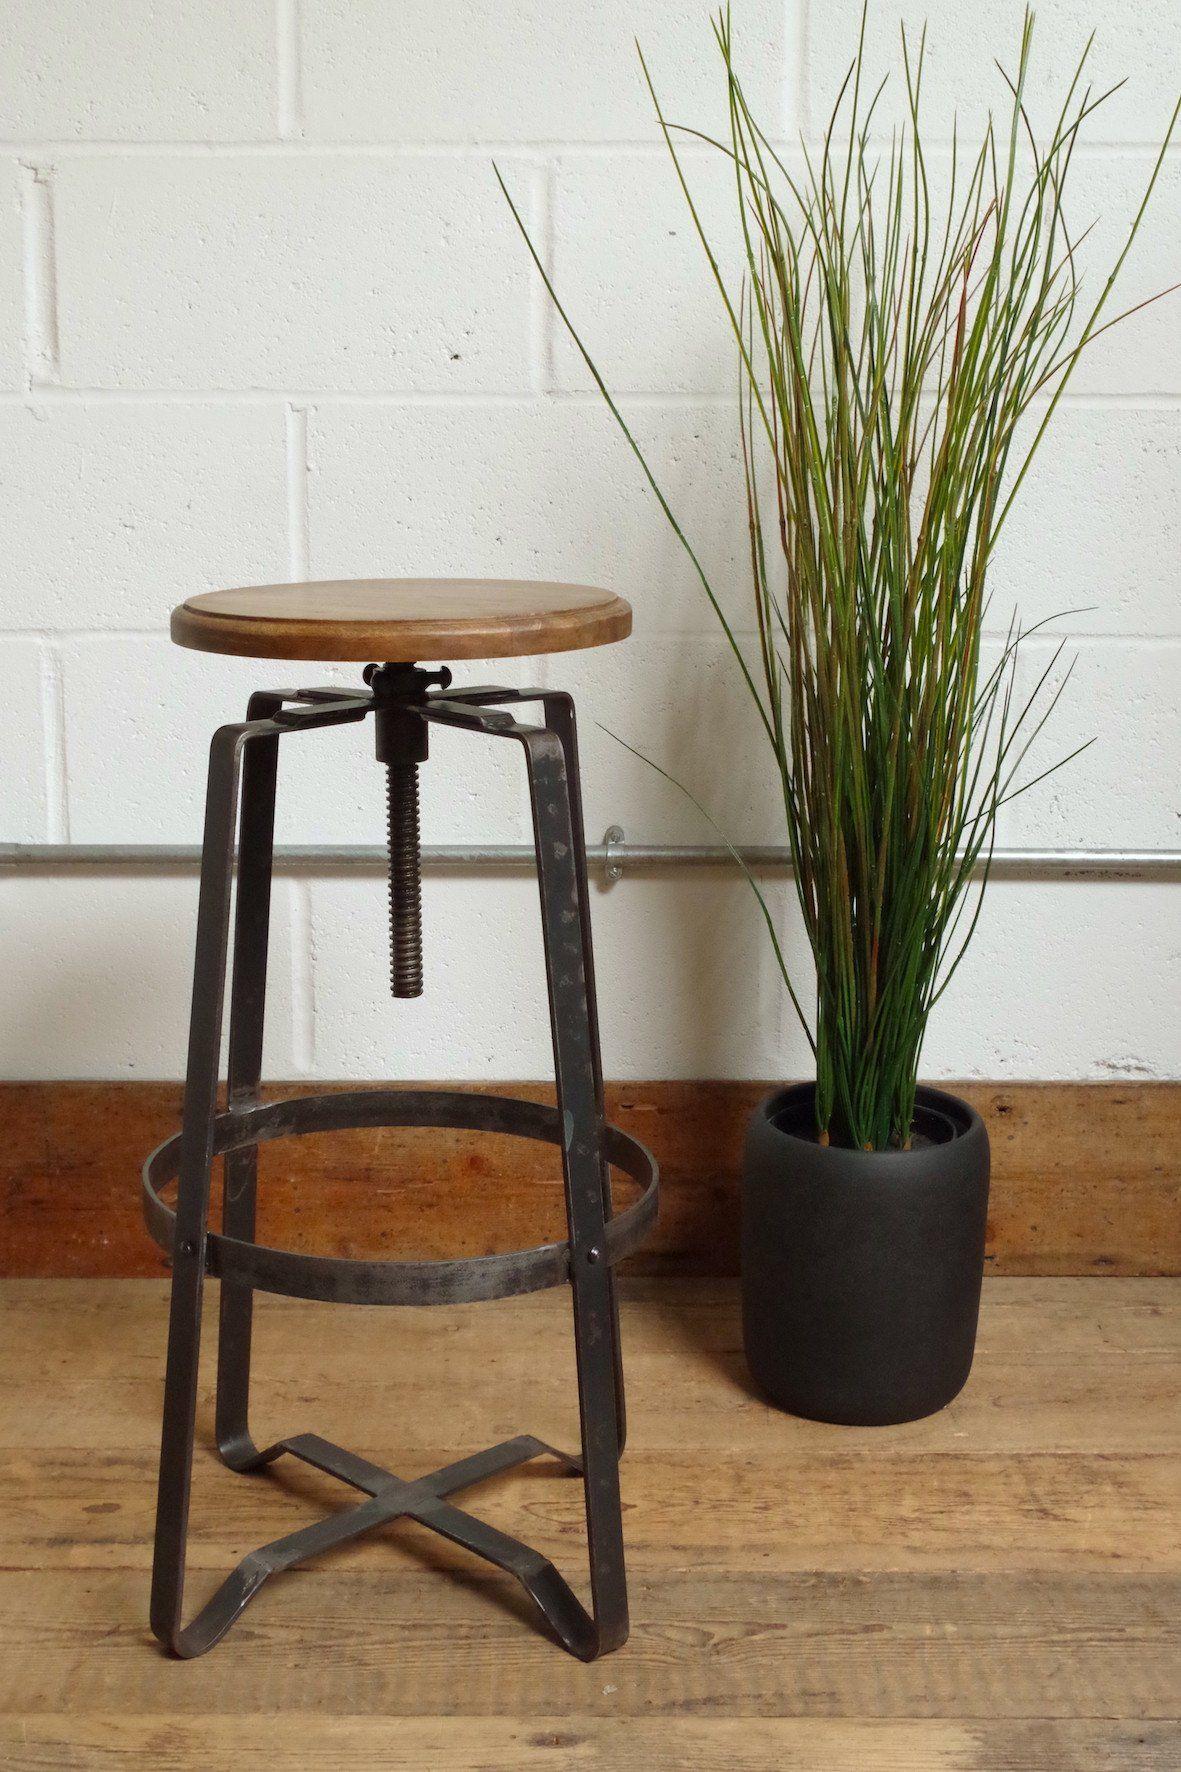 Industrial Swivel Bar Stool Industrial bar stools